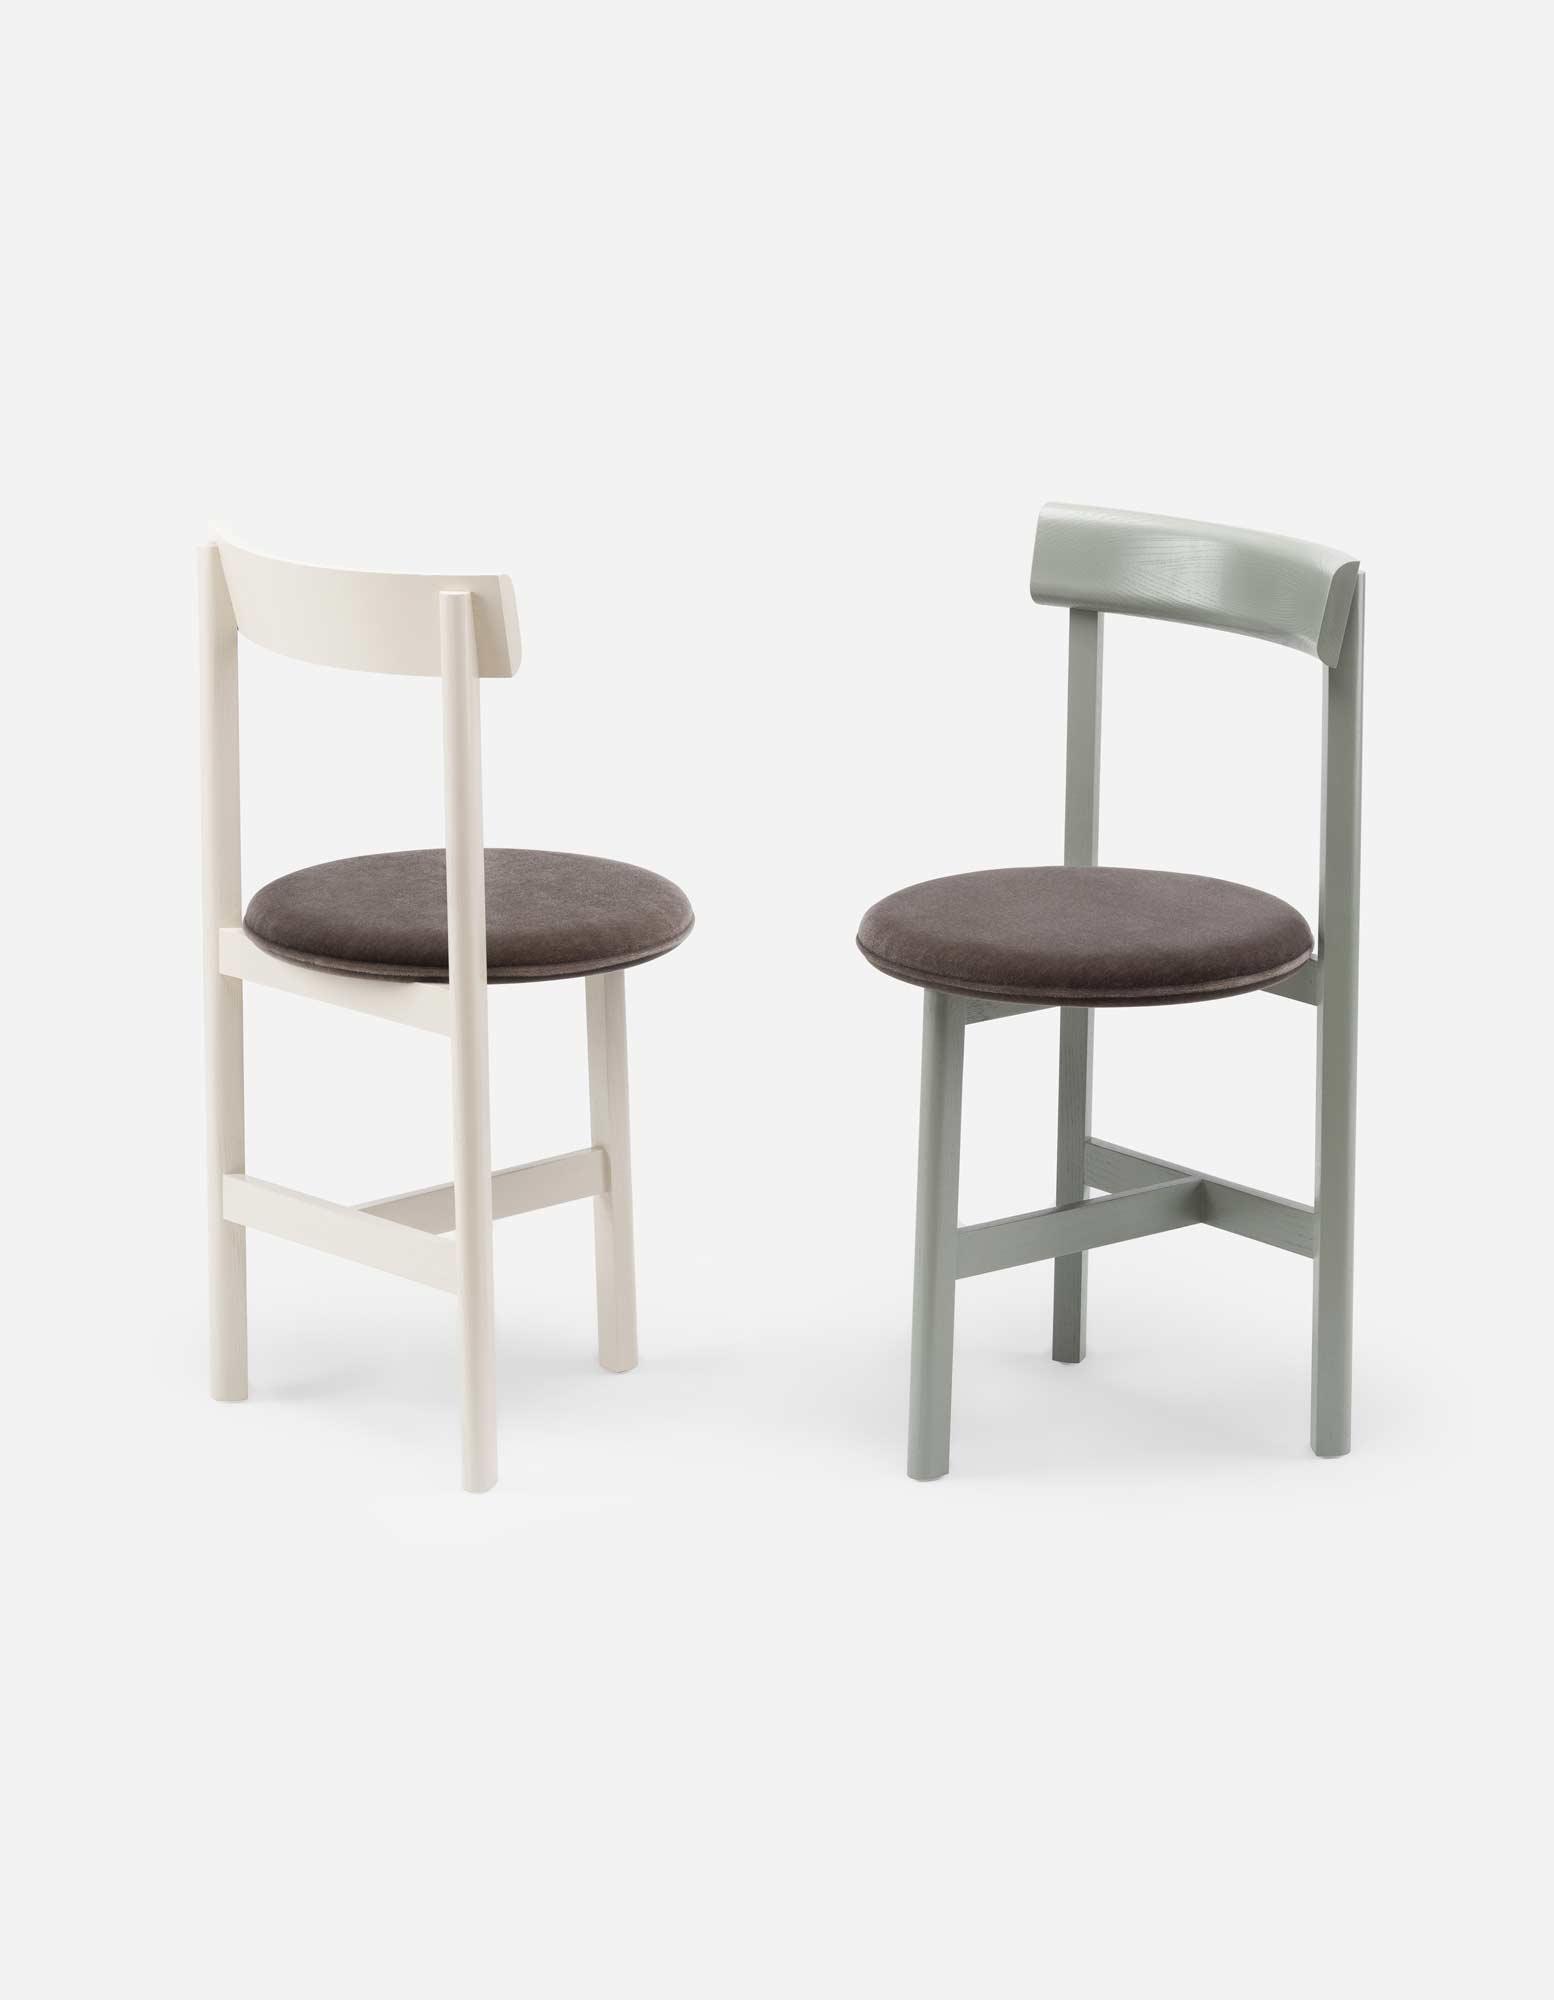 Kompakter Stuhl von Neri & Hu für De La Espada